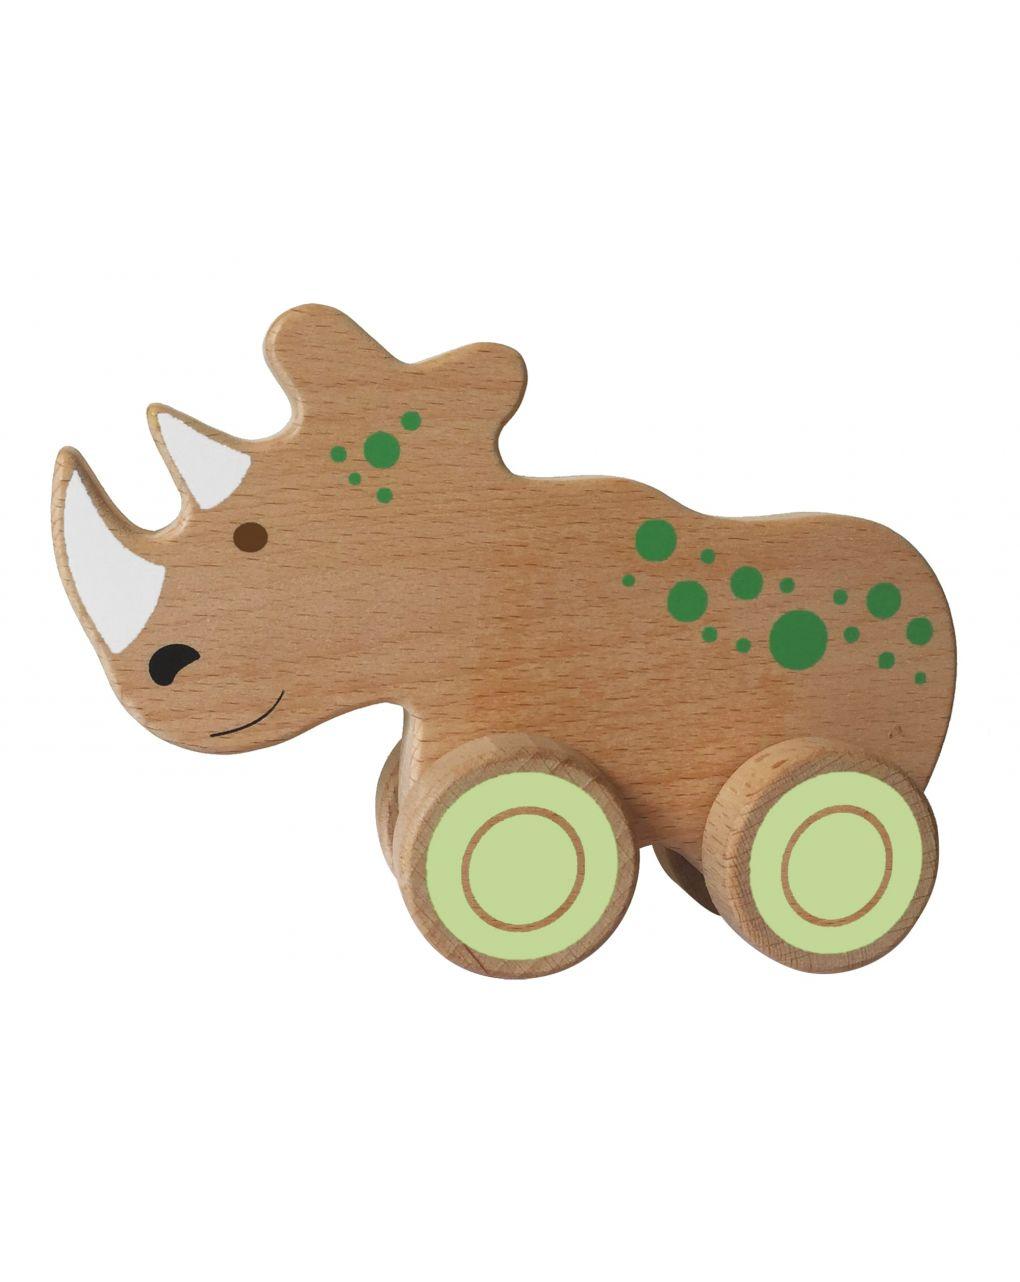 Wood n play - animali in legno con ruote - Wood'N'Play